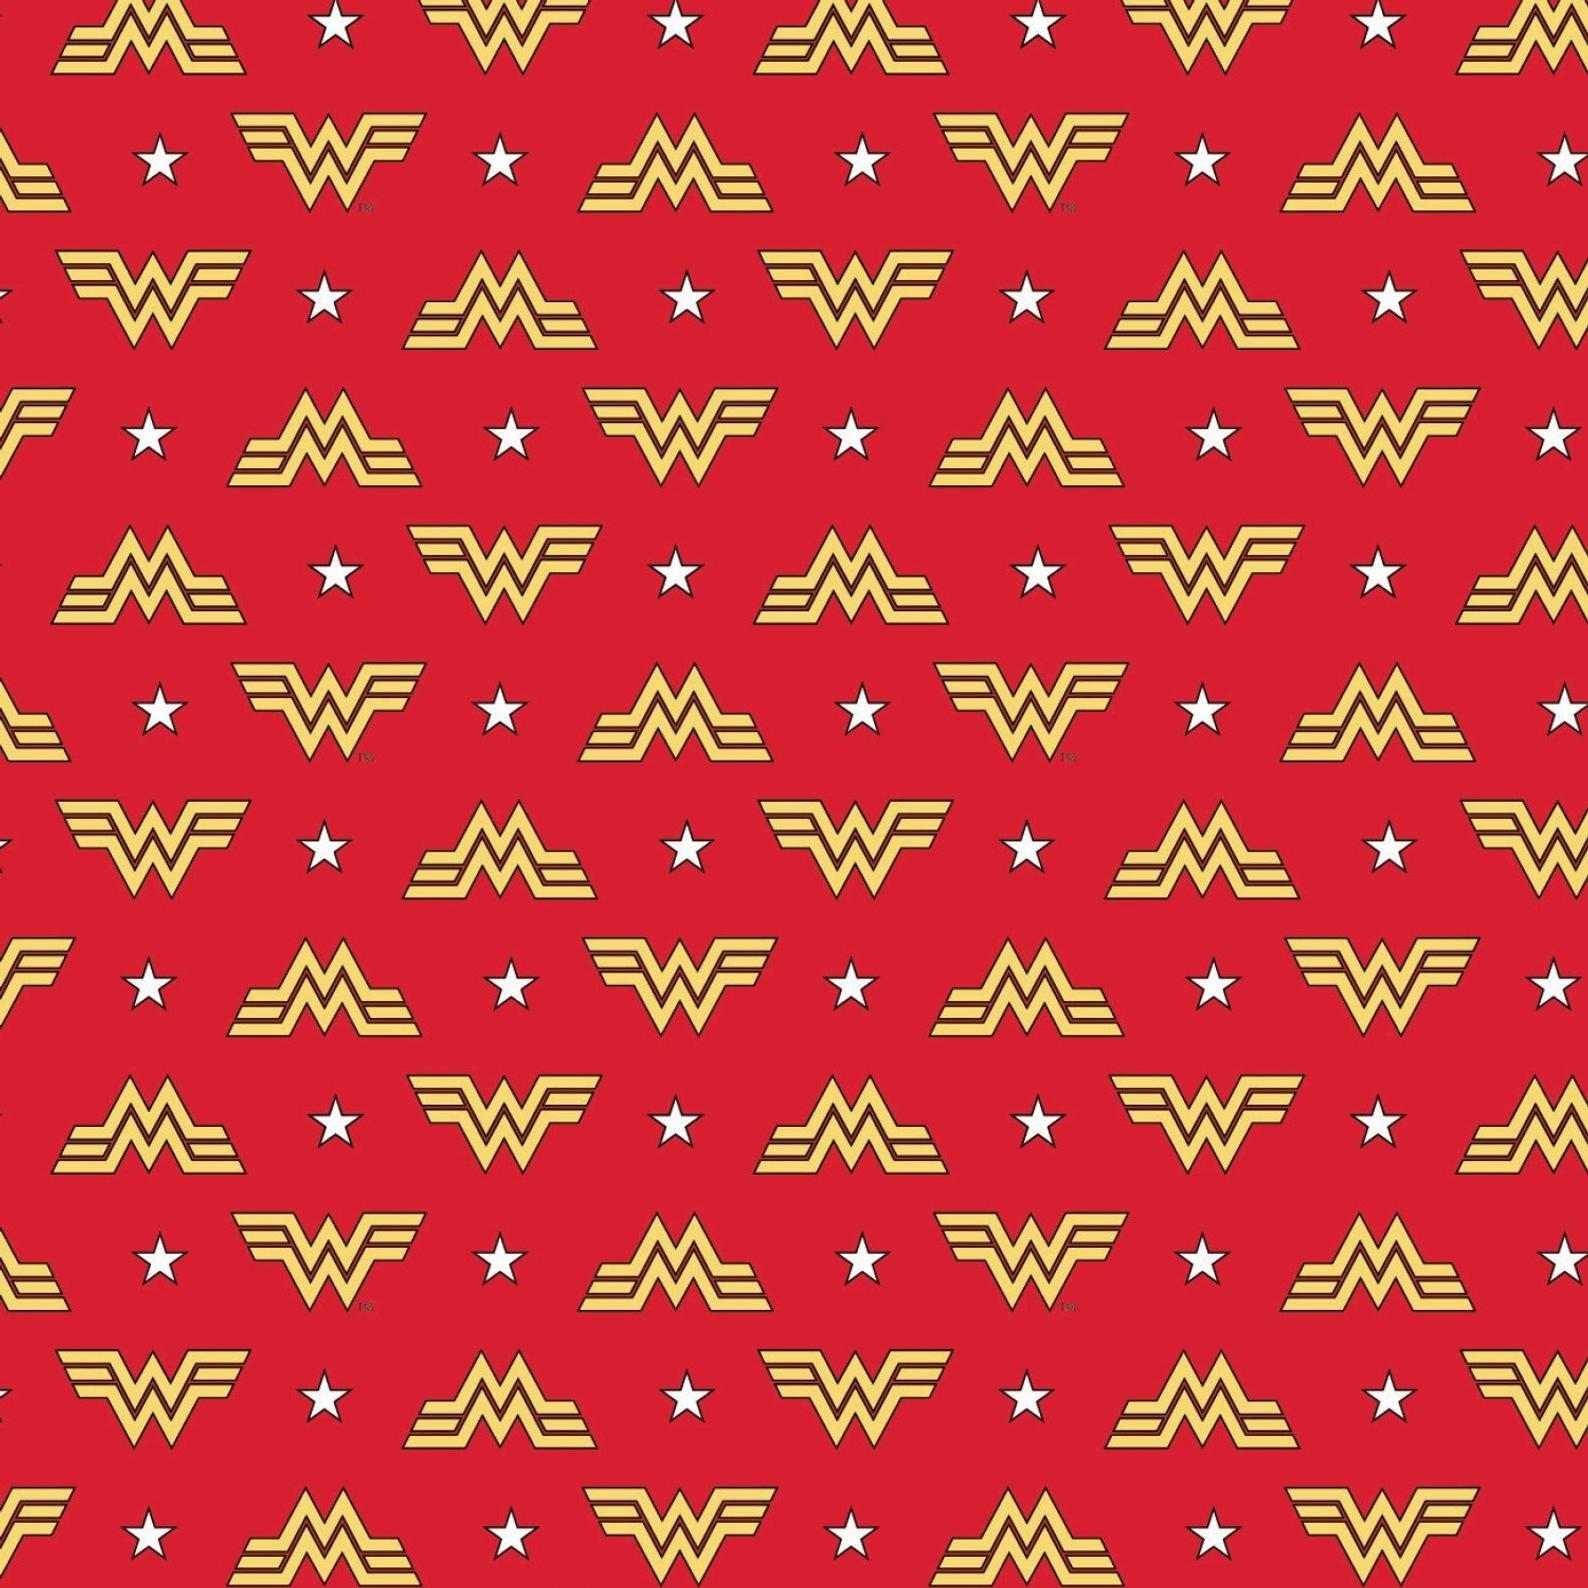 Wonder Woman Logo + Stars